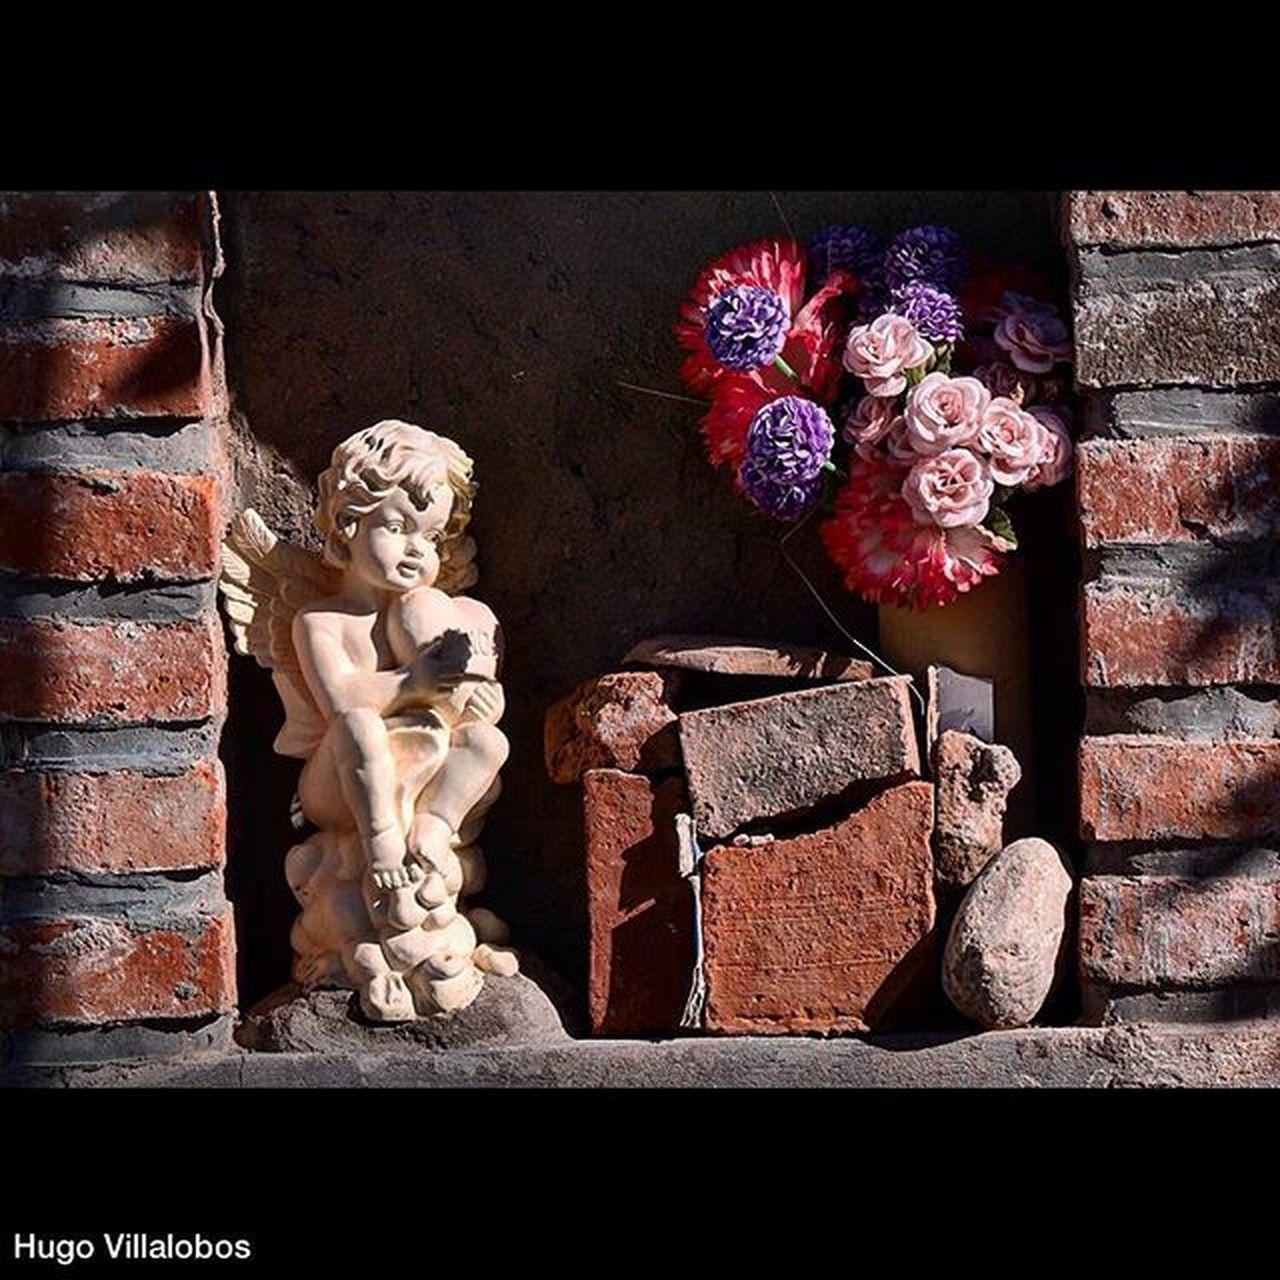 Arg Jujuy Maimara Photodocumentary La tumba del angelito ......